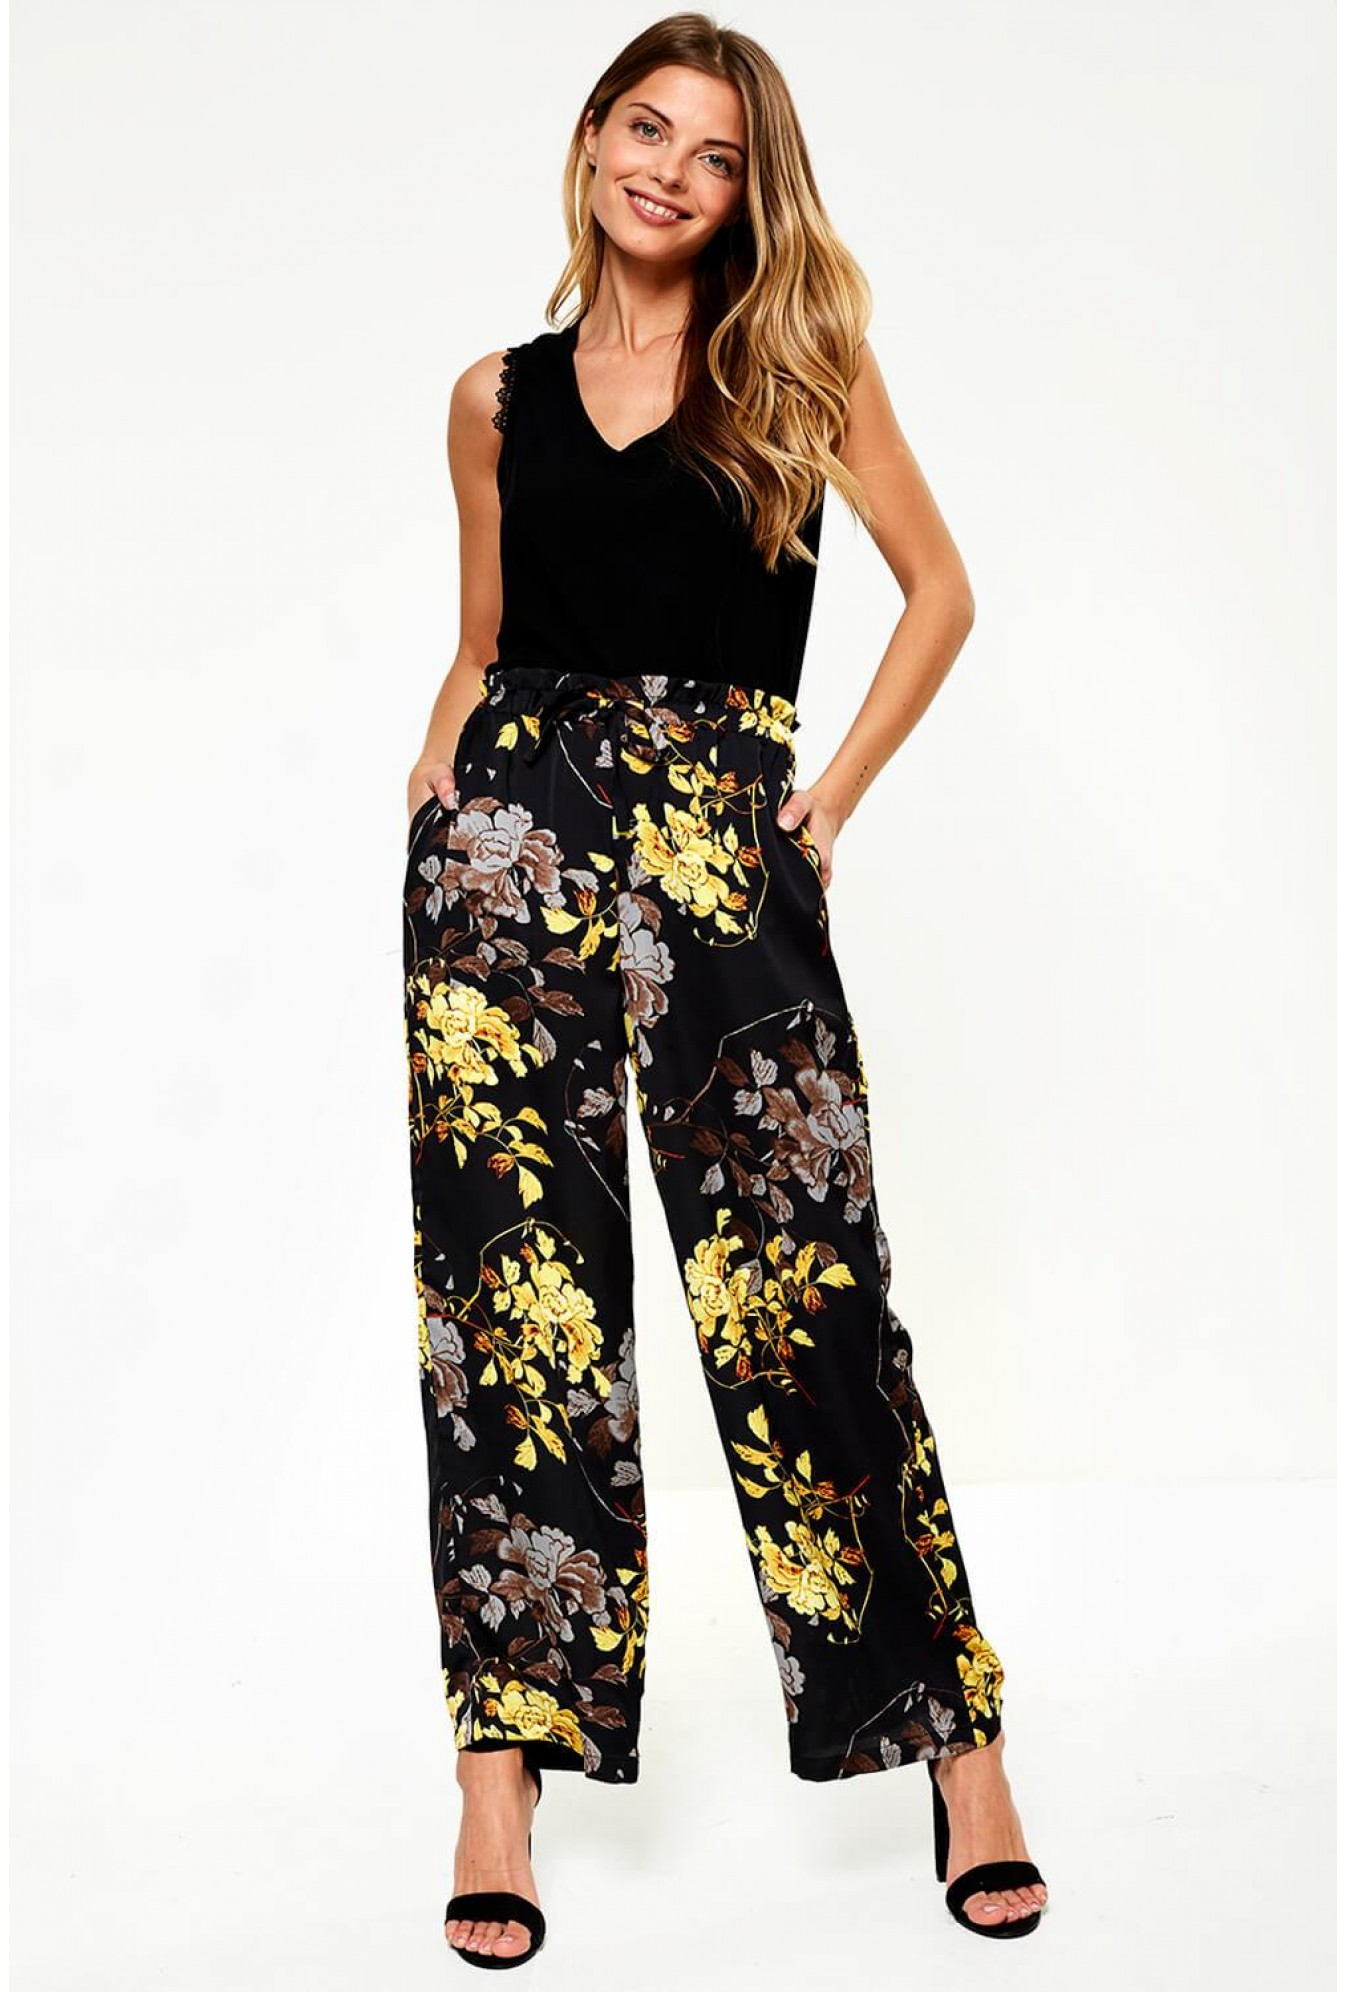 7a447207fa68 Vila Eliana Wide Leg Trousers in Black Floral Print | iCLOTHING